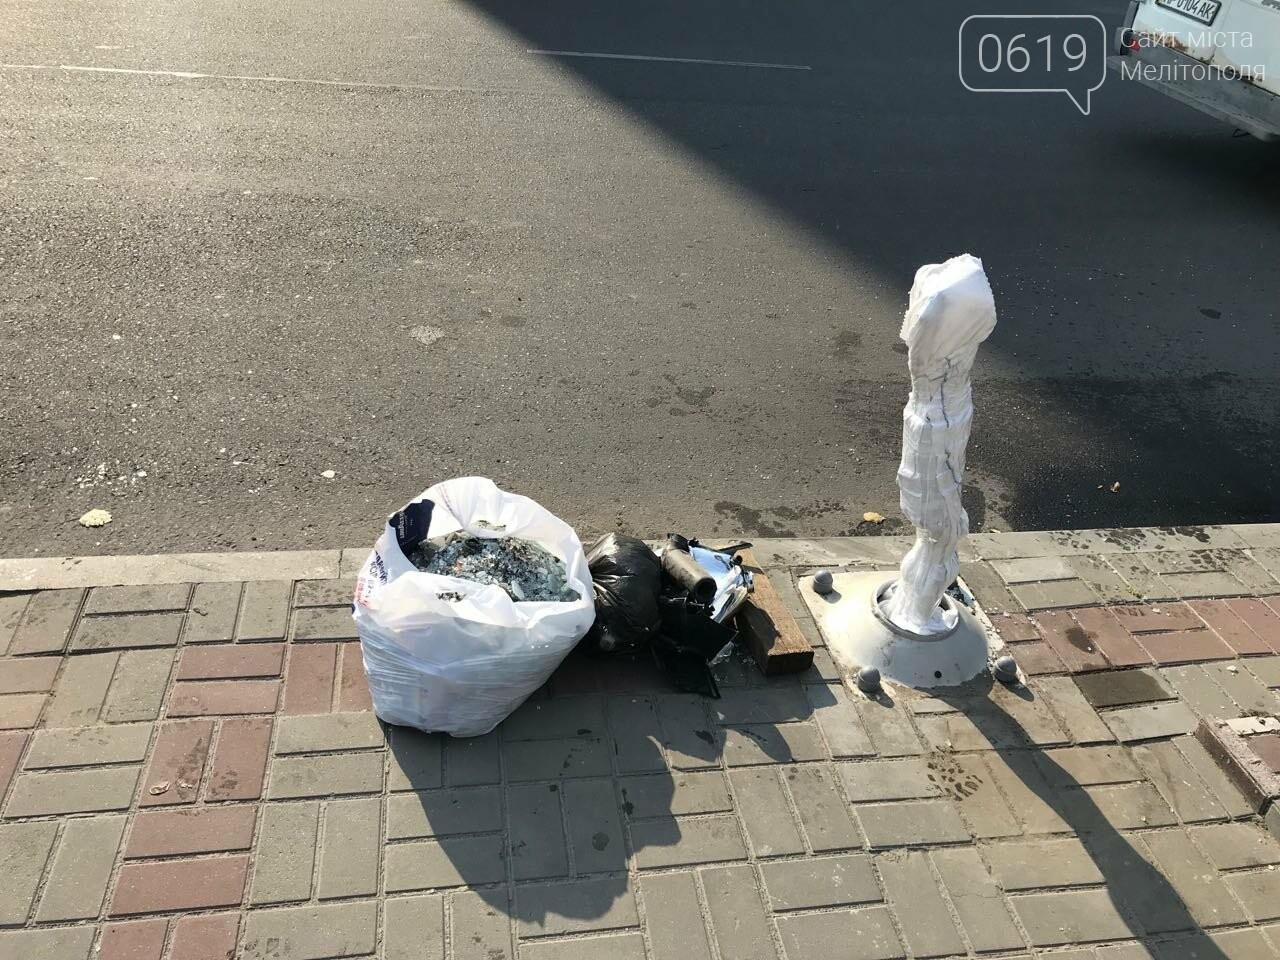 В центре Мелитополя водитель снес электроопору, - ФОТО, фото-5